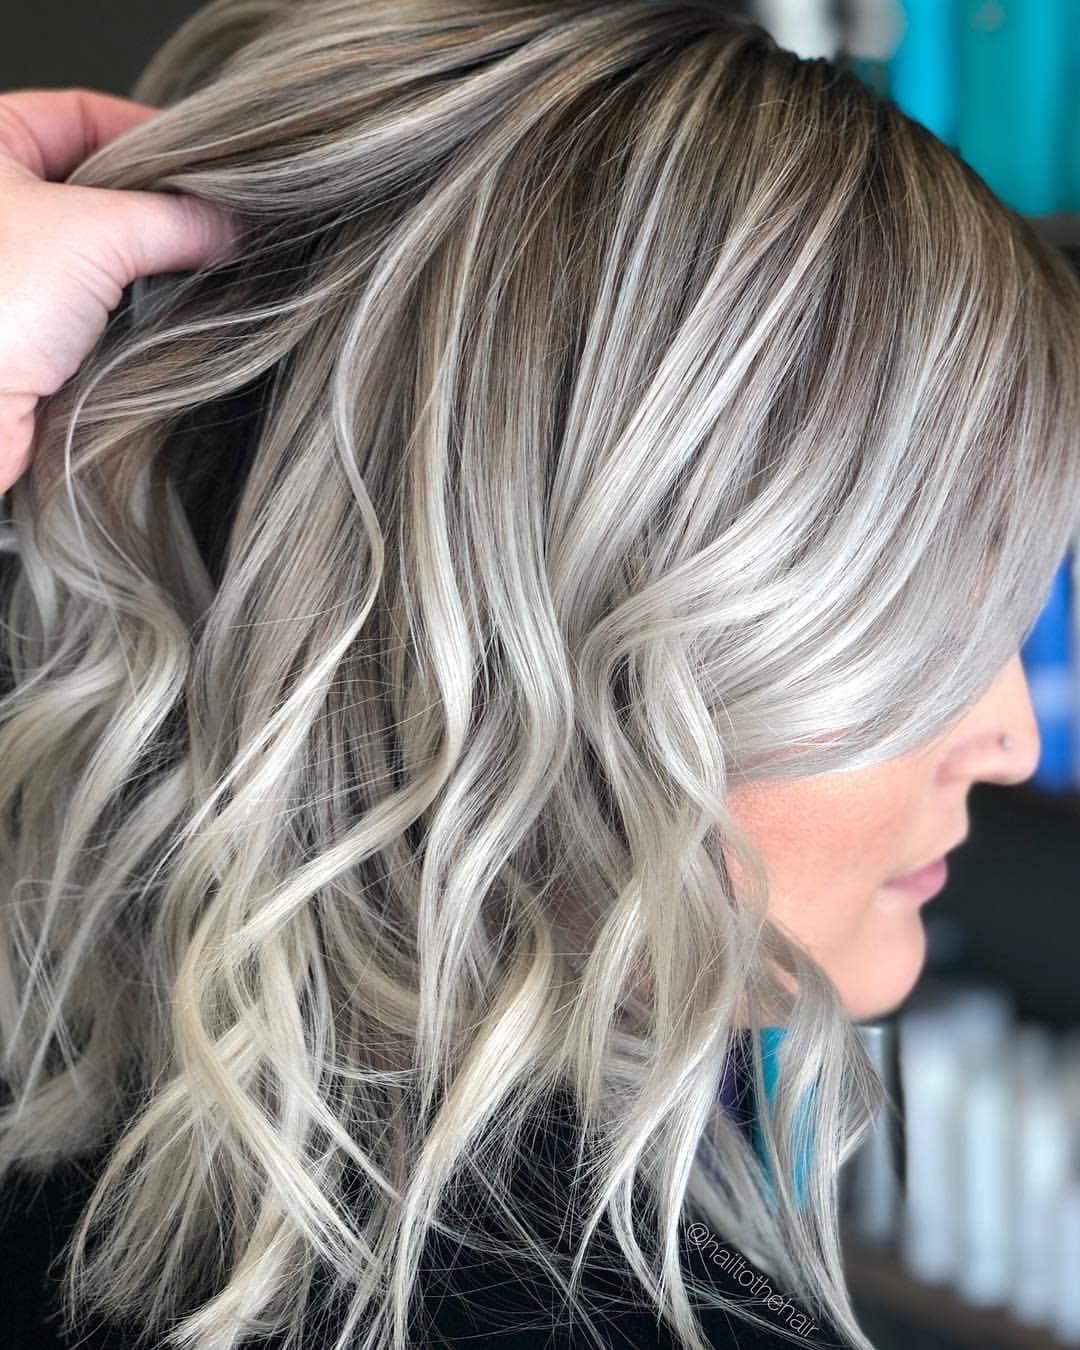 Icy Blonde Balayage Hair In 2019 Dark Roots Blonde Hair Icy